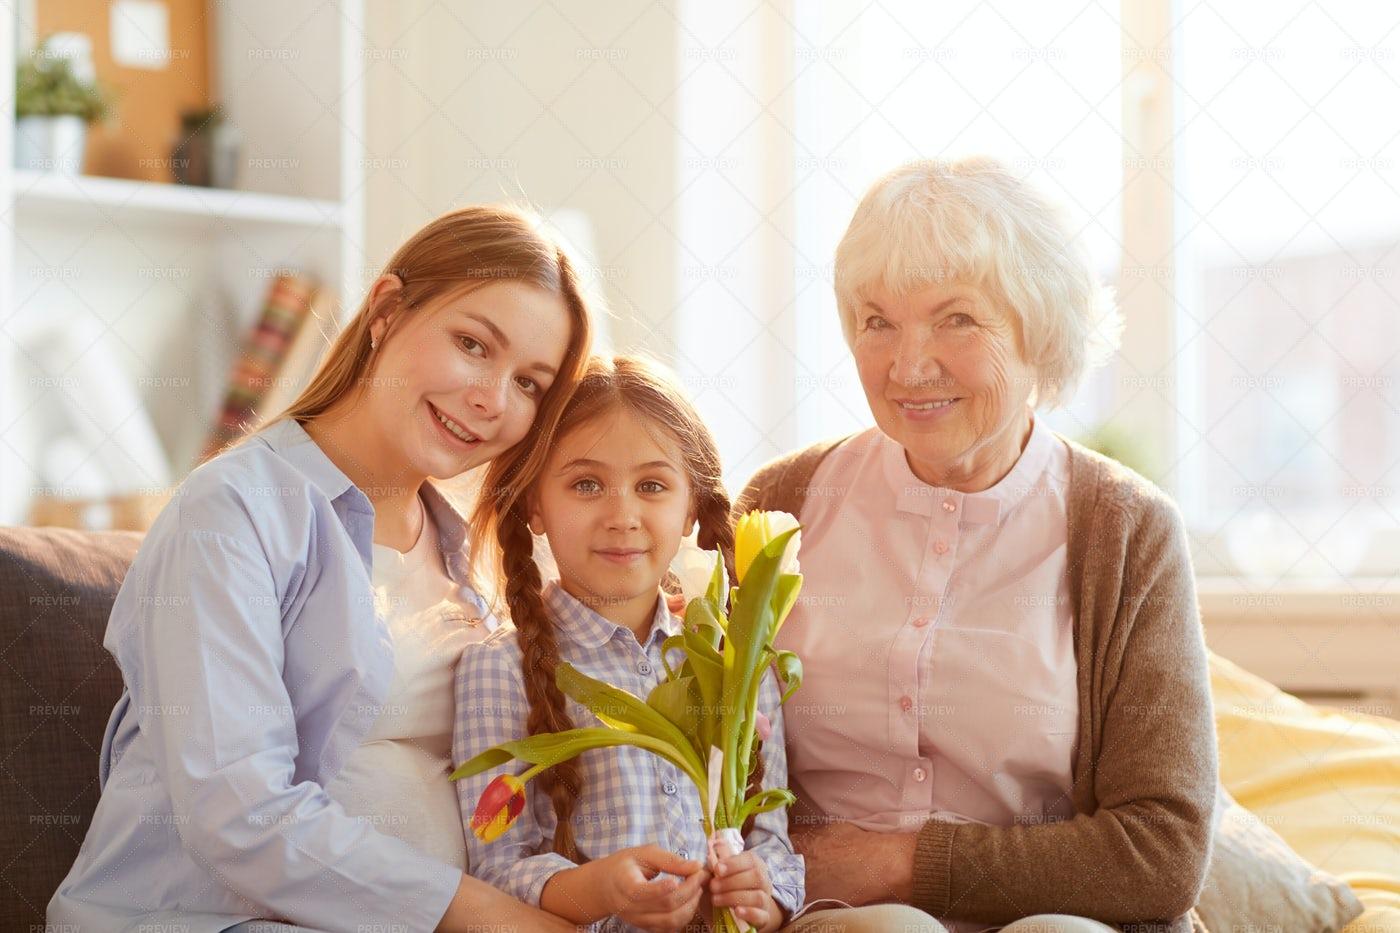 Women In Family Posing: Stock Photos